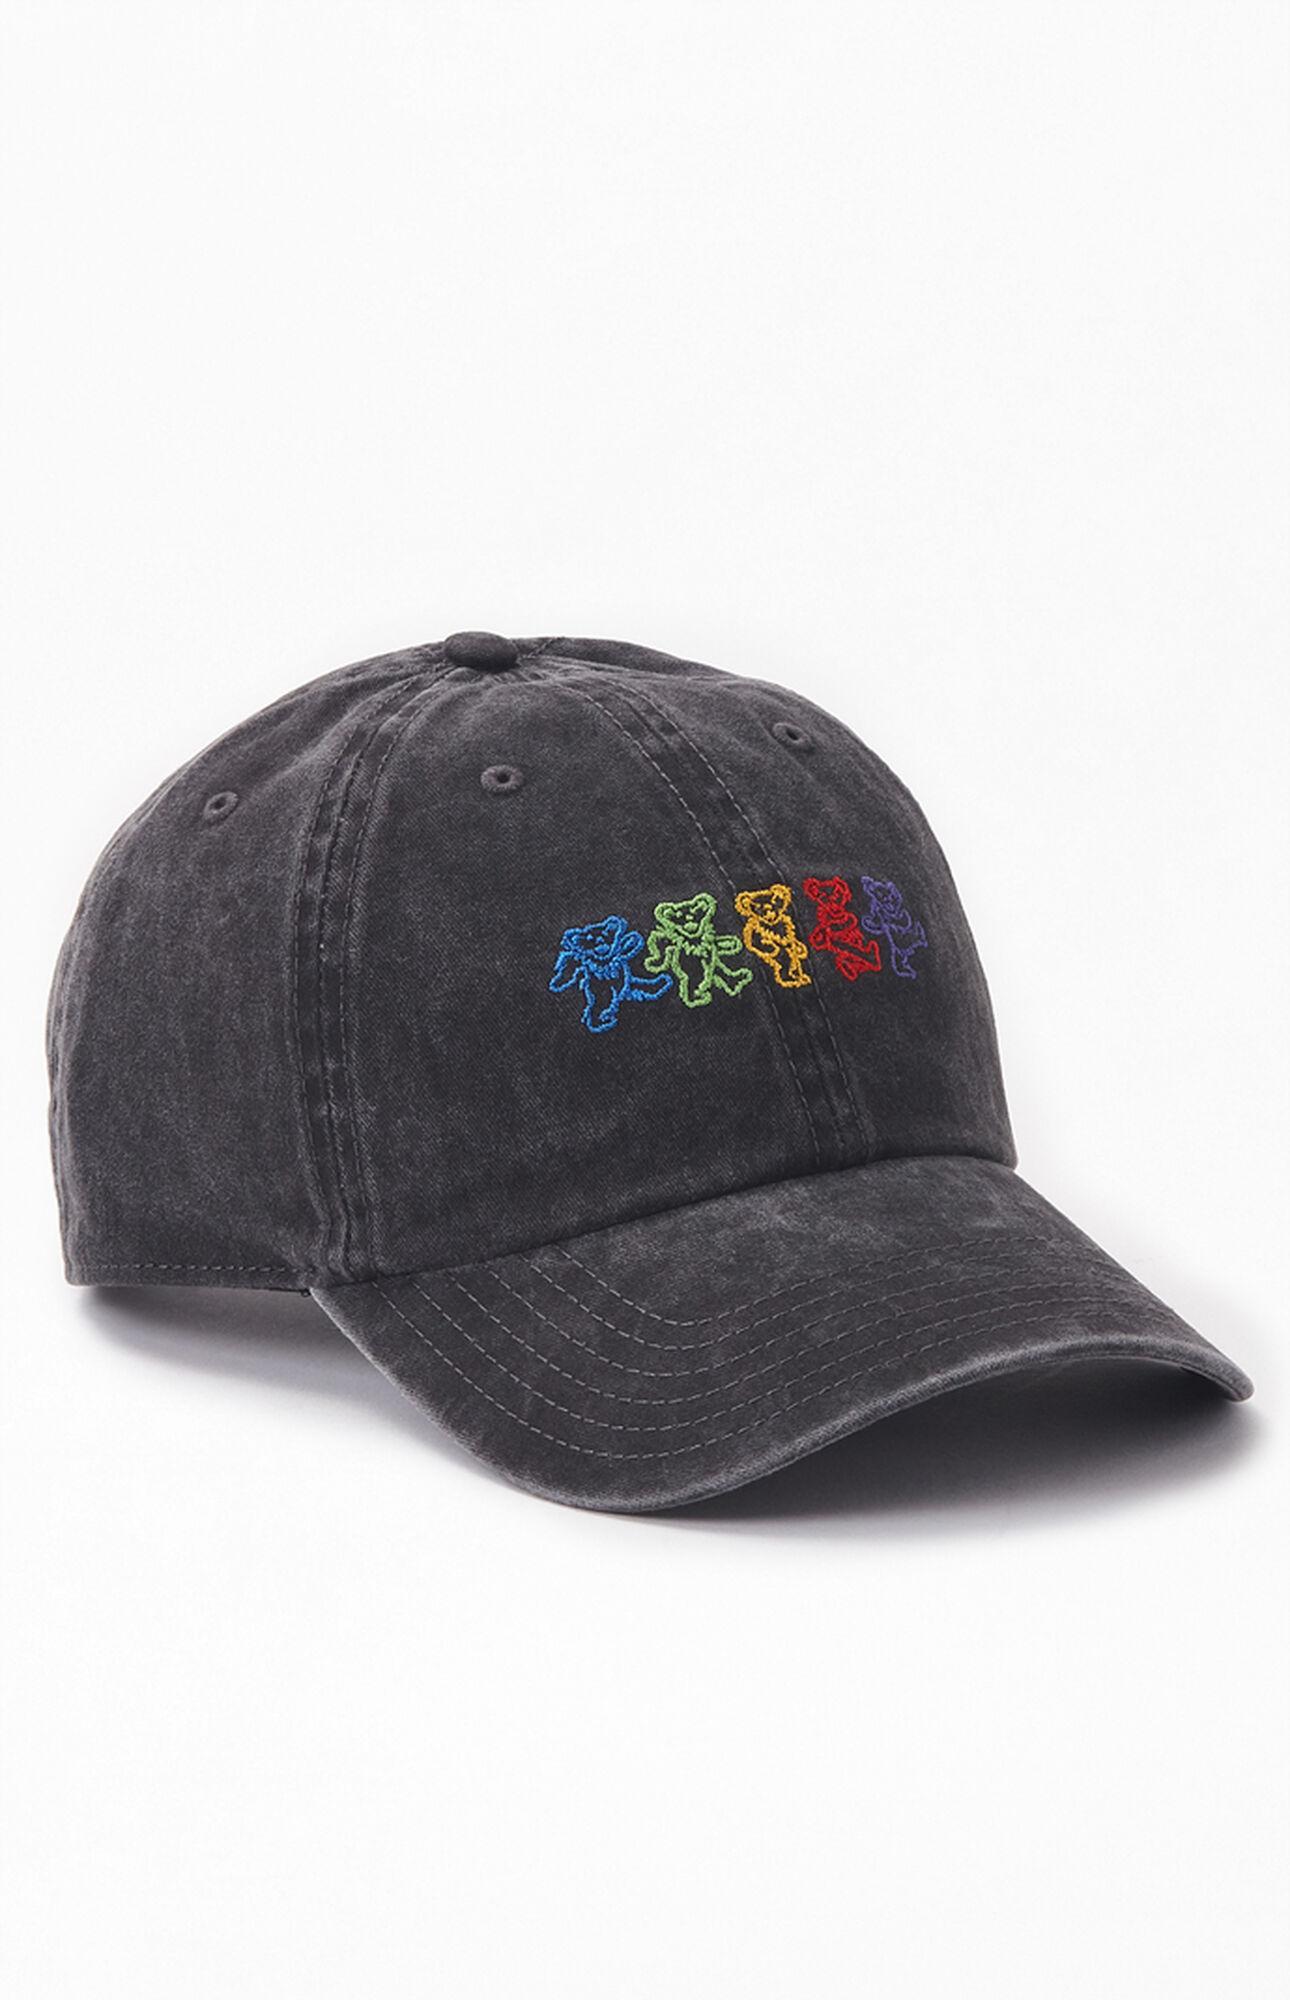 Grateful Dead Classic Baseball Cap with Adjustable Hat Men Women Unisex